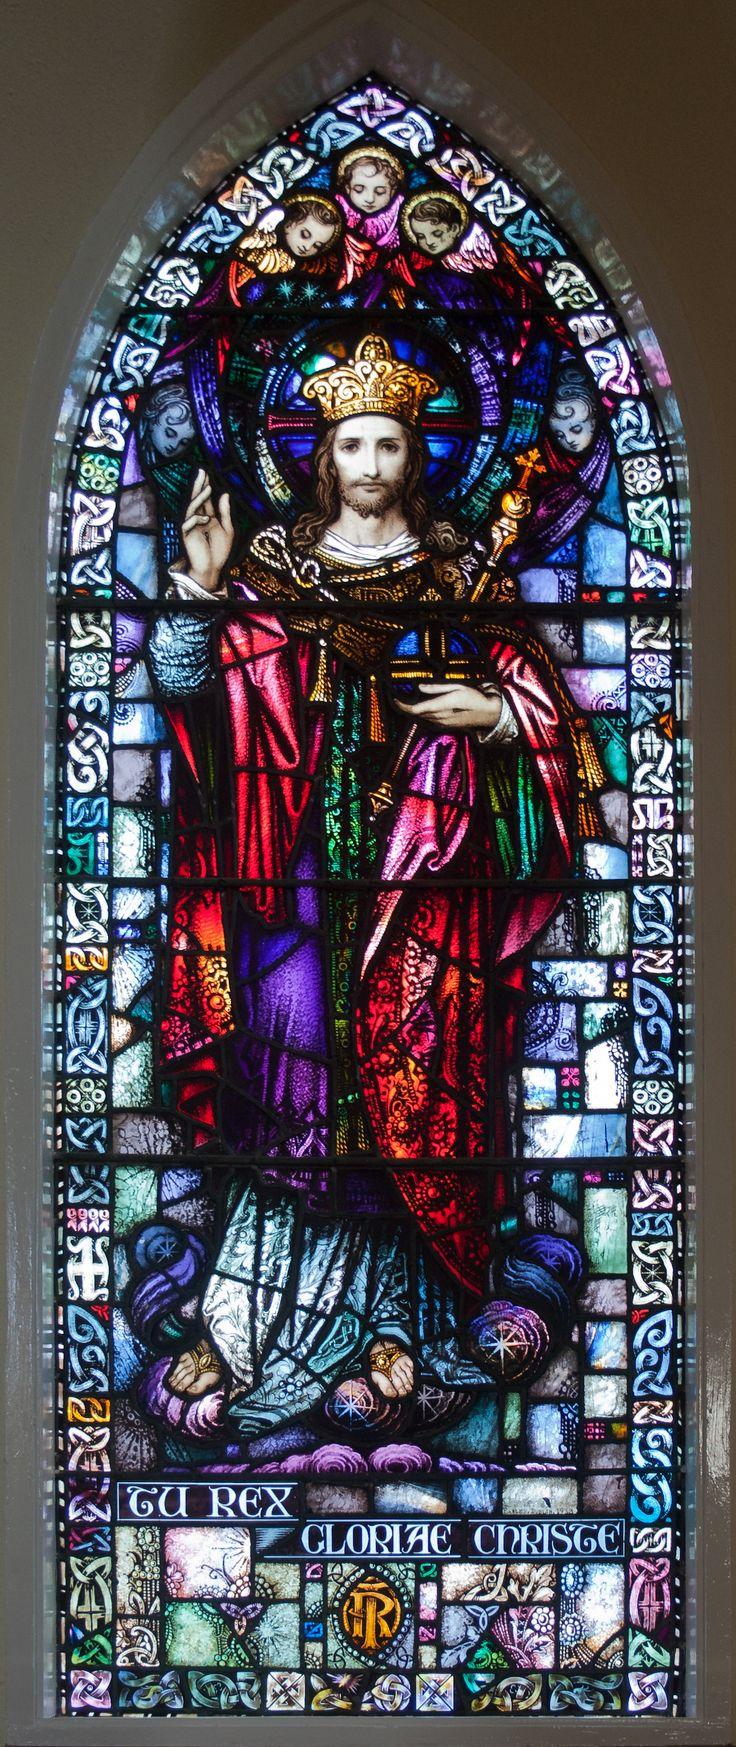 Christ as King and Ruler   File:Toomyvara St. Joseph's Church Window Tu Rex Gloriae Christe by ...